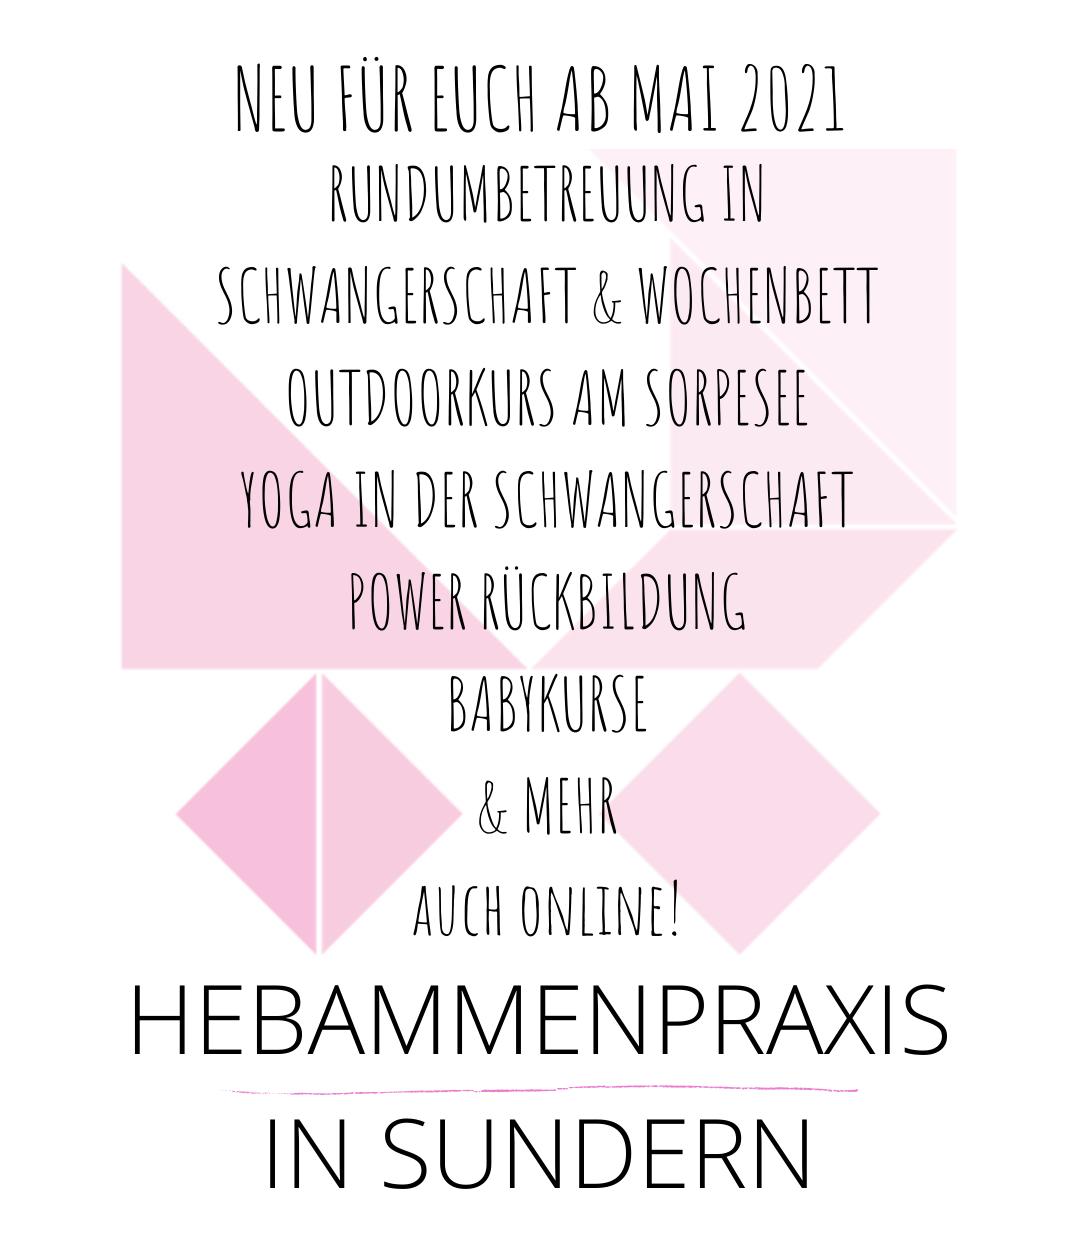 Hebammenpraxis_Sundern_Werbung